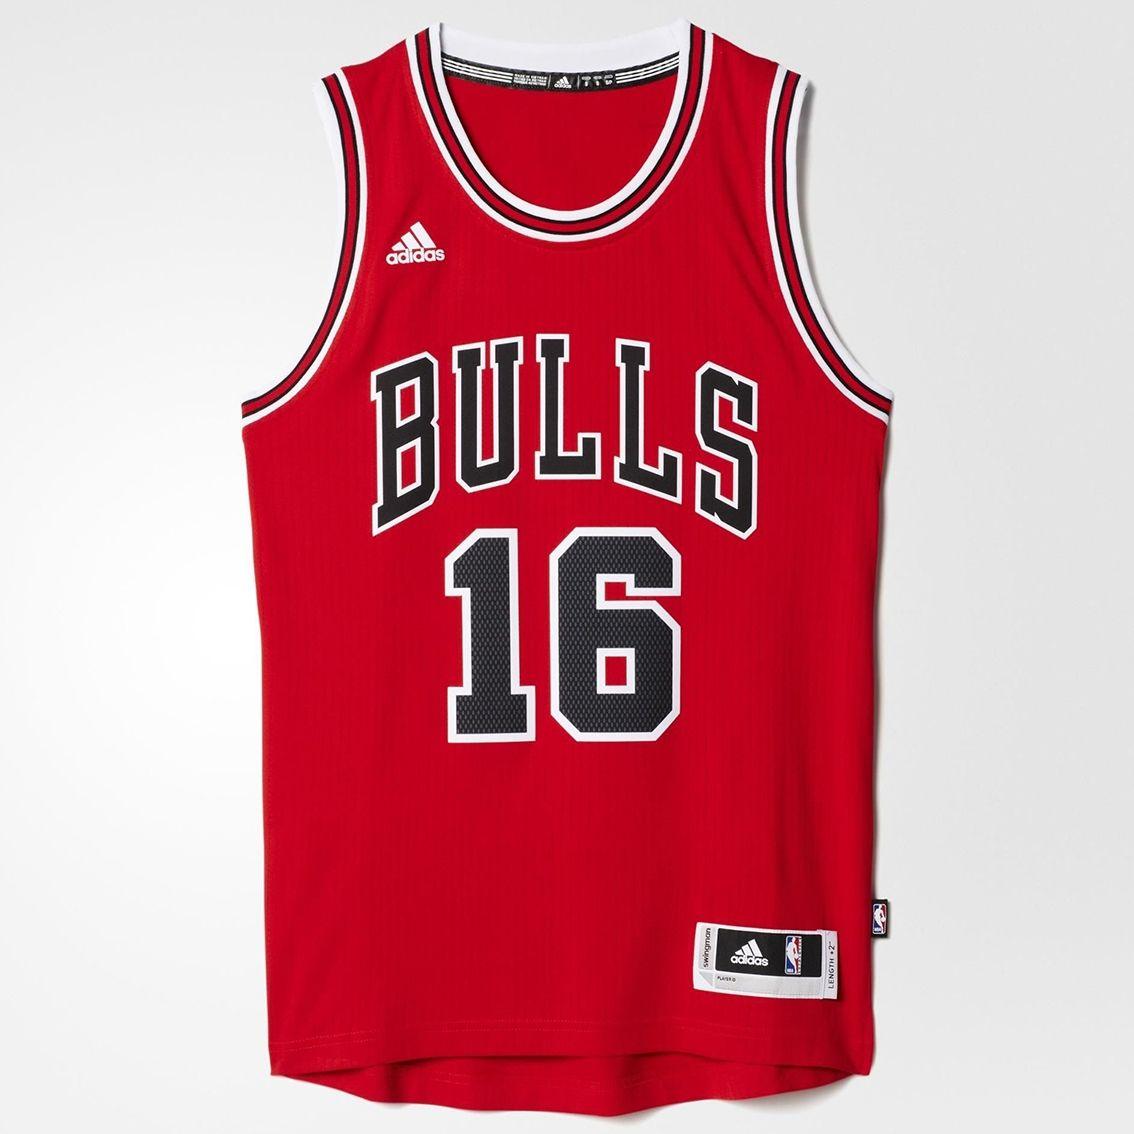 the best attitude 133b9 7c27d Type Shirts adidas NBA Chicago Bulls Pau Gasol Swingman Jersey